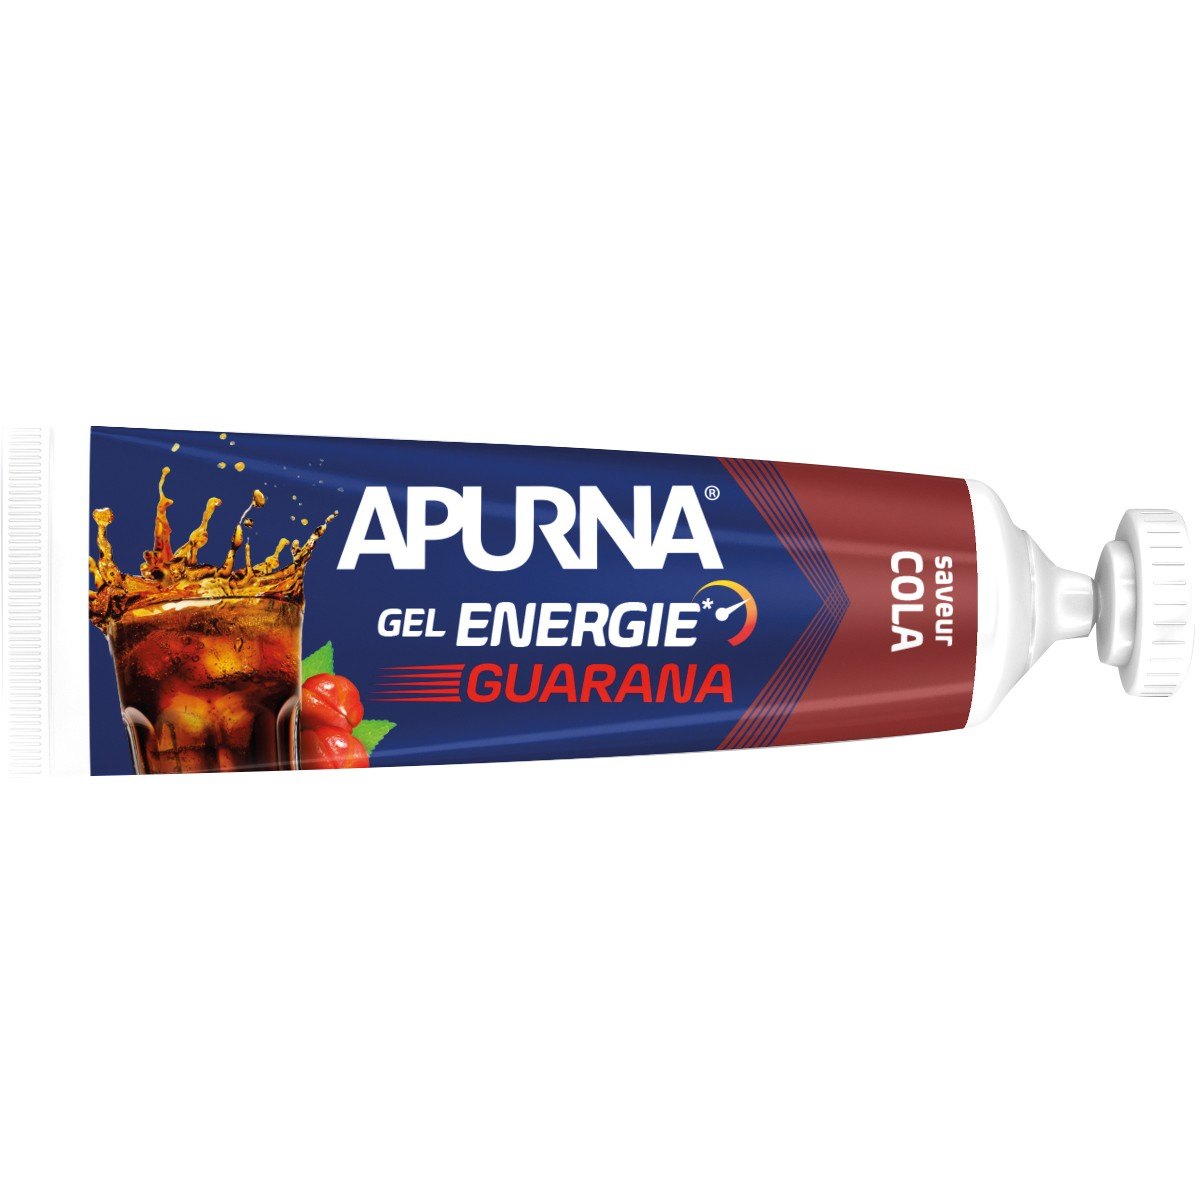 GEL ENERGIE APURNA 35G - PASSAGE DIFFICLE - AROME GUARANA COLA